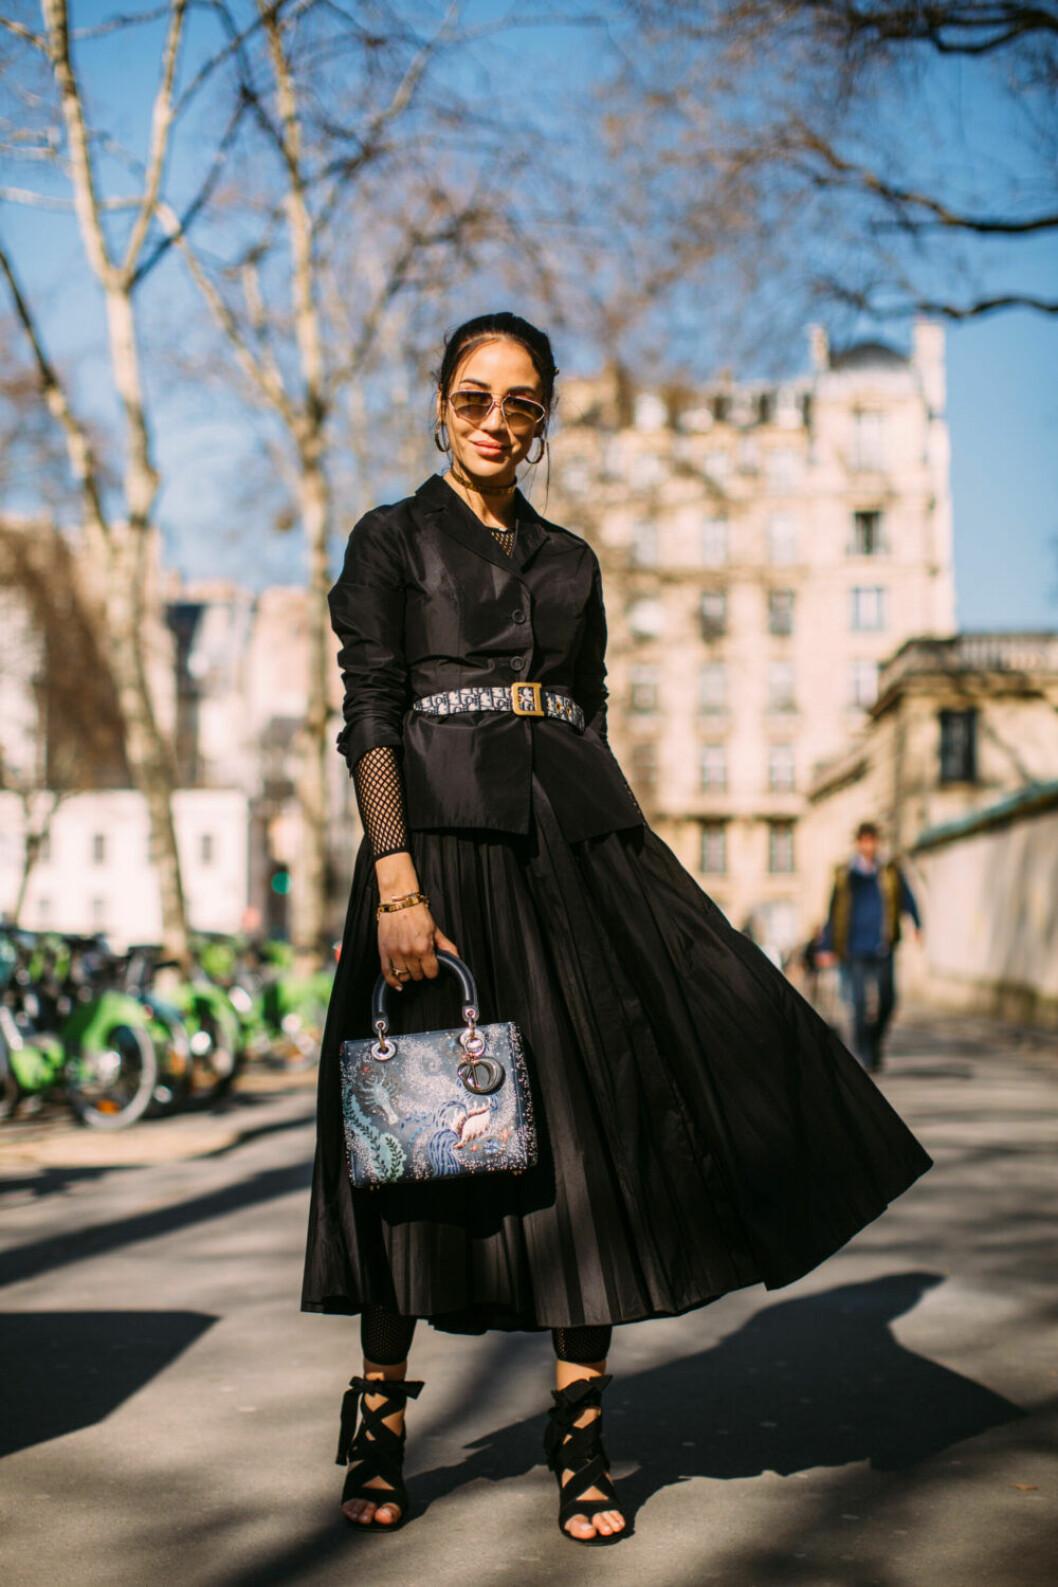 Streetstyle Paris FW, Tamara Kalinic.